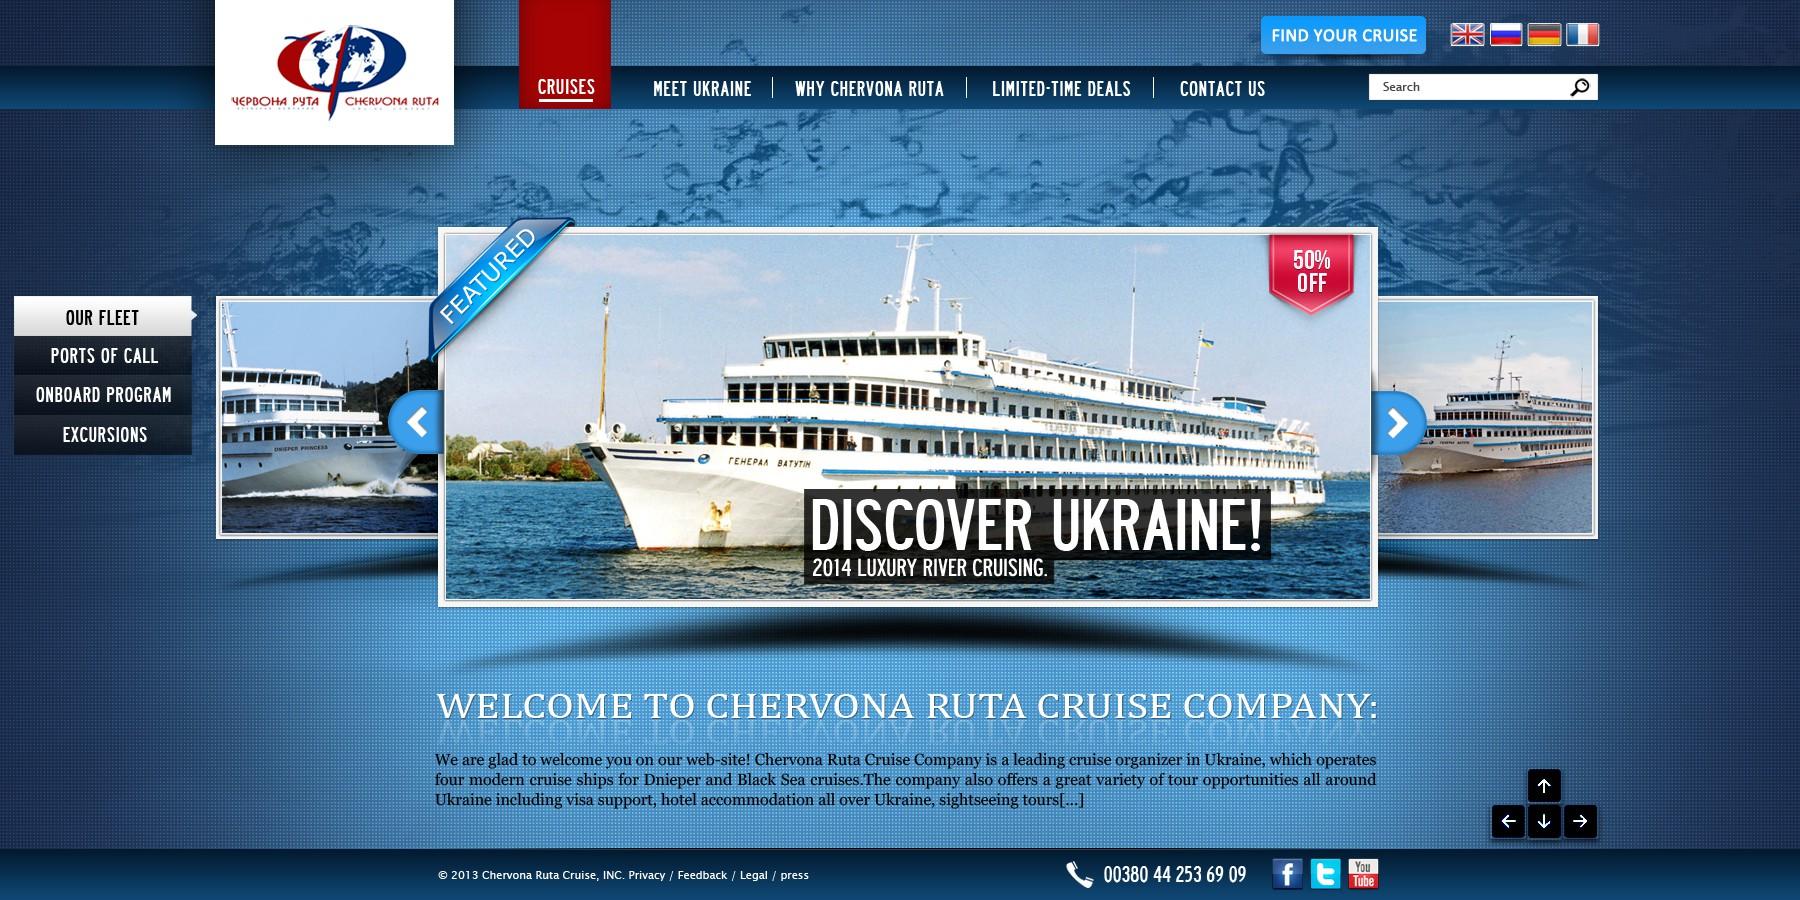 Designing the best website in river-cruising